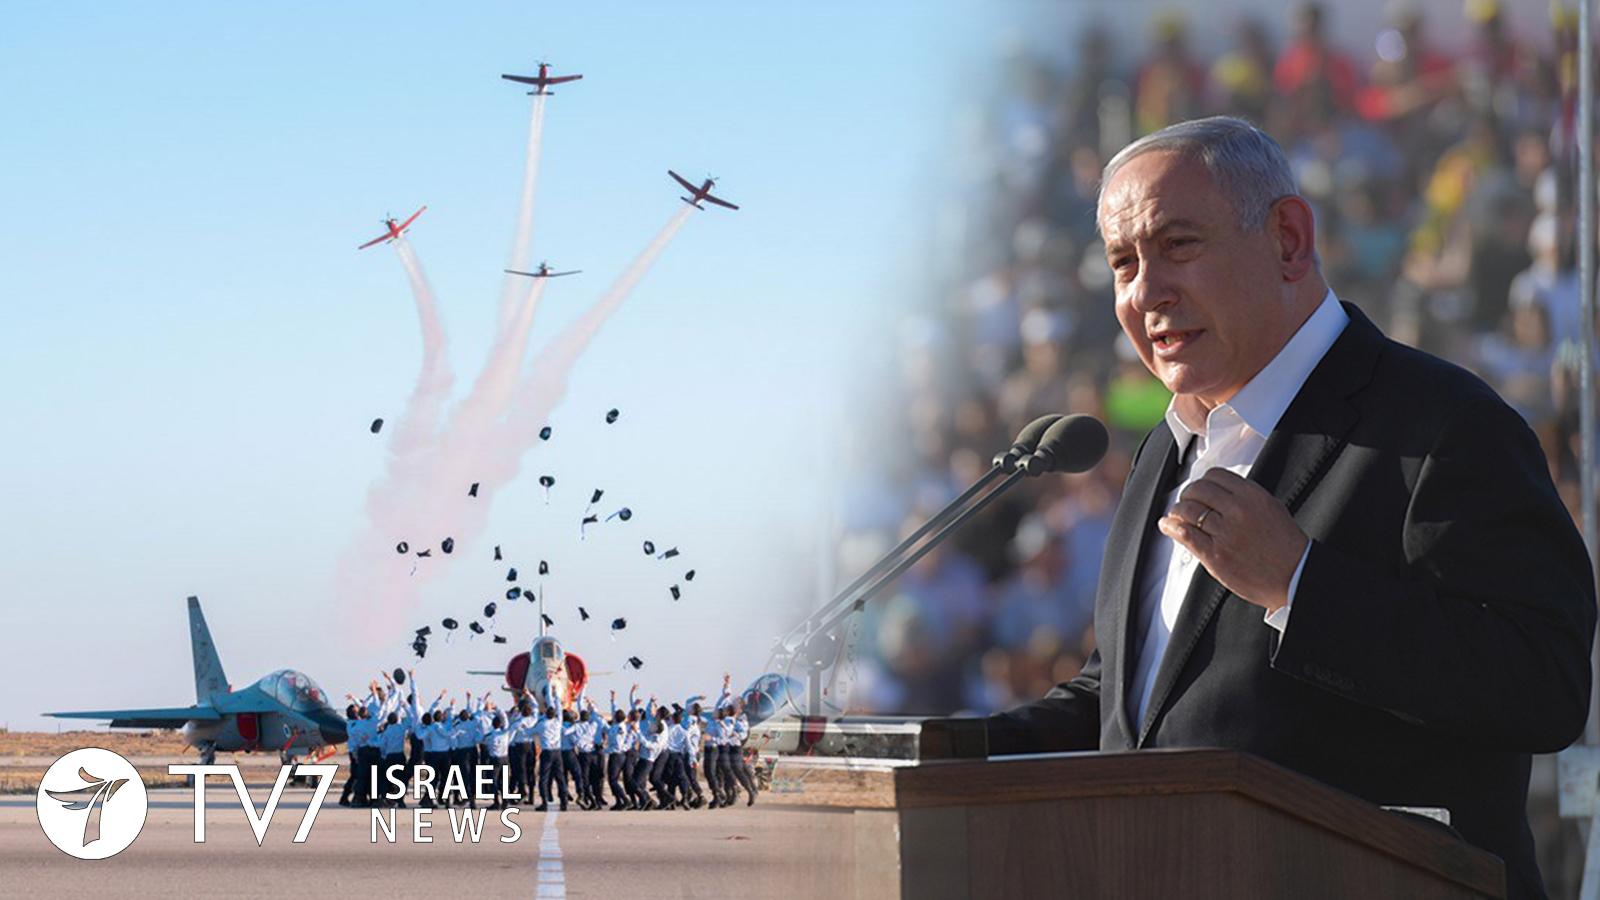 netanyahu graduation ceremony of idf air force pilot course